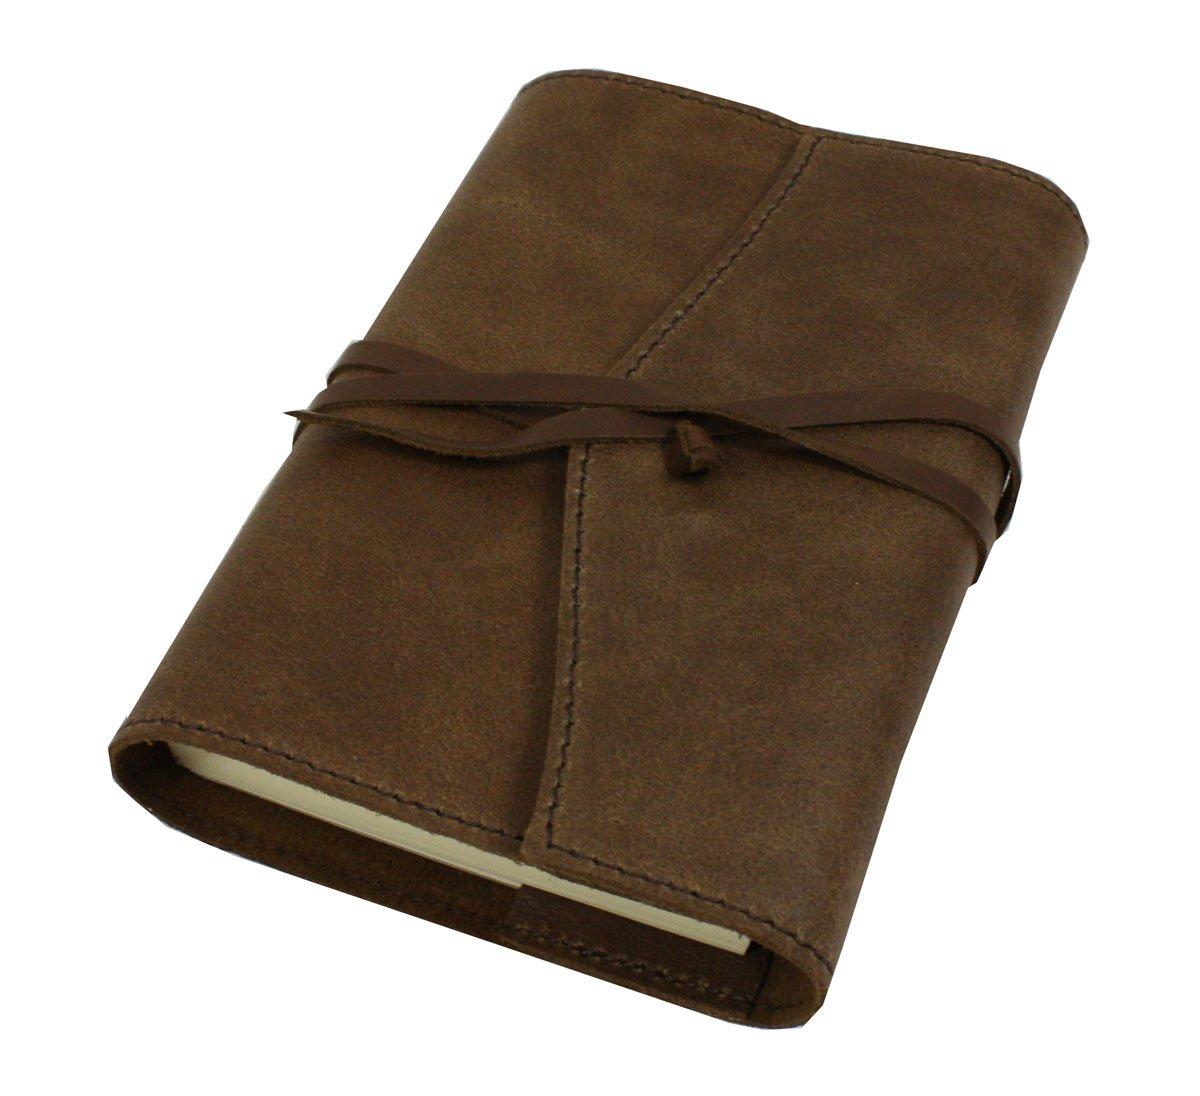 Papuro Milano Refillable Handmade Italian Chocolate Brown Leather Address Book - 9 x 13 cm